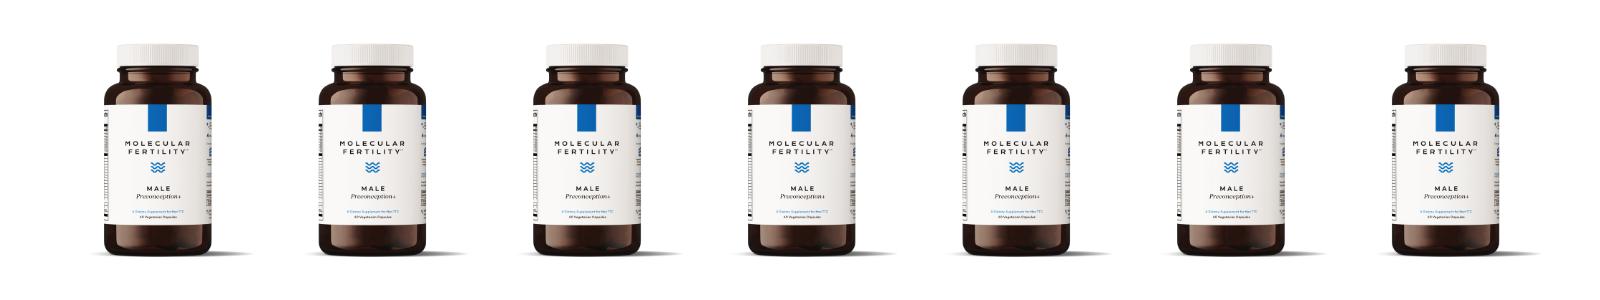 Vitamins to Increase Sperm Motility